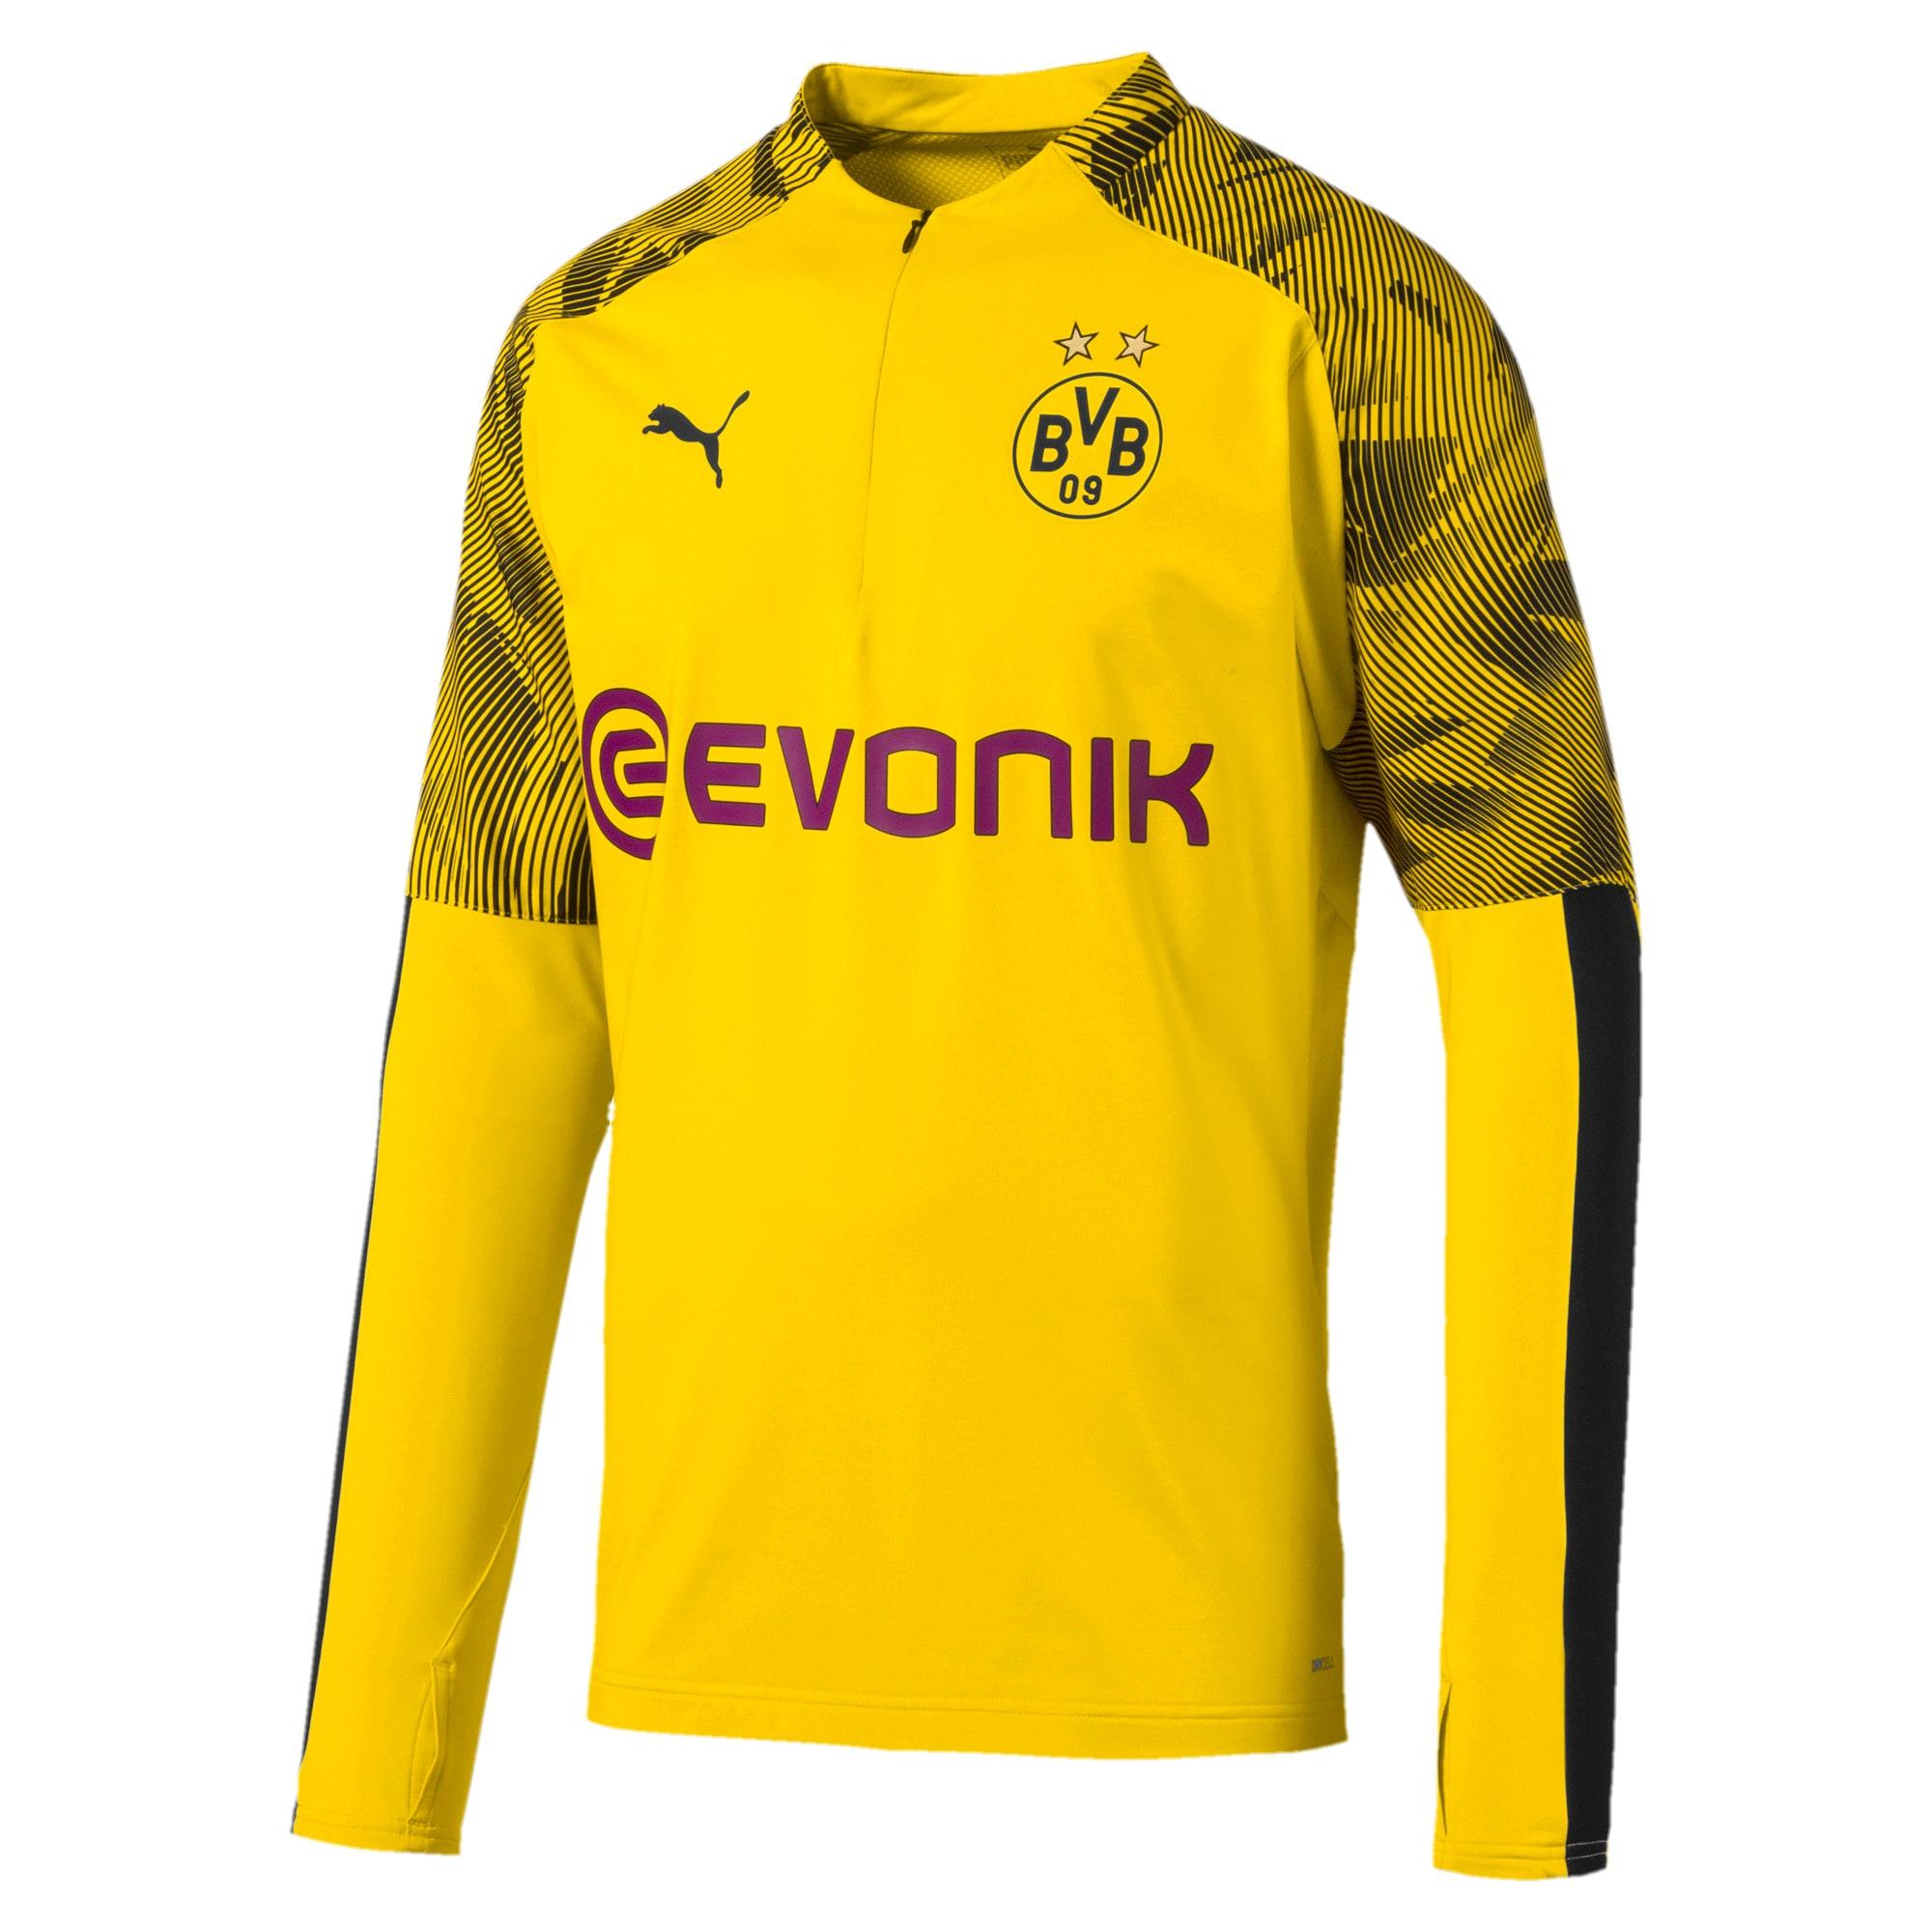 Thumbnail 4 of BVB Men's 1/4 Zip Training Top, Cyber Yellow-Puma Black, medium